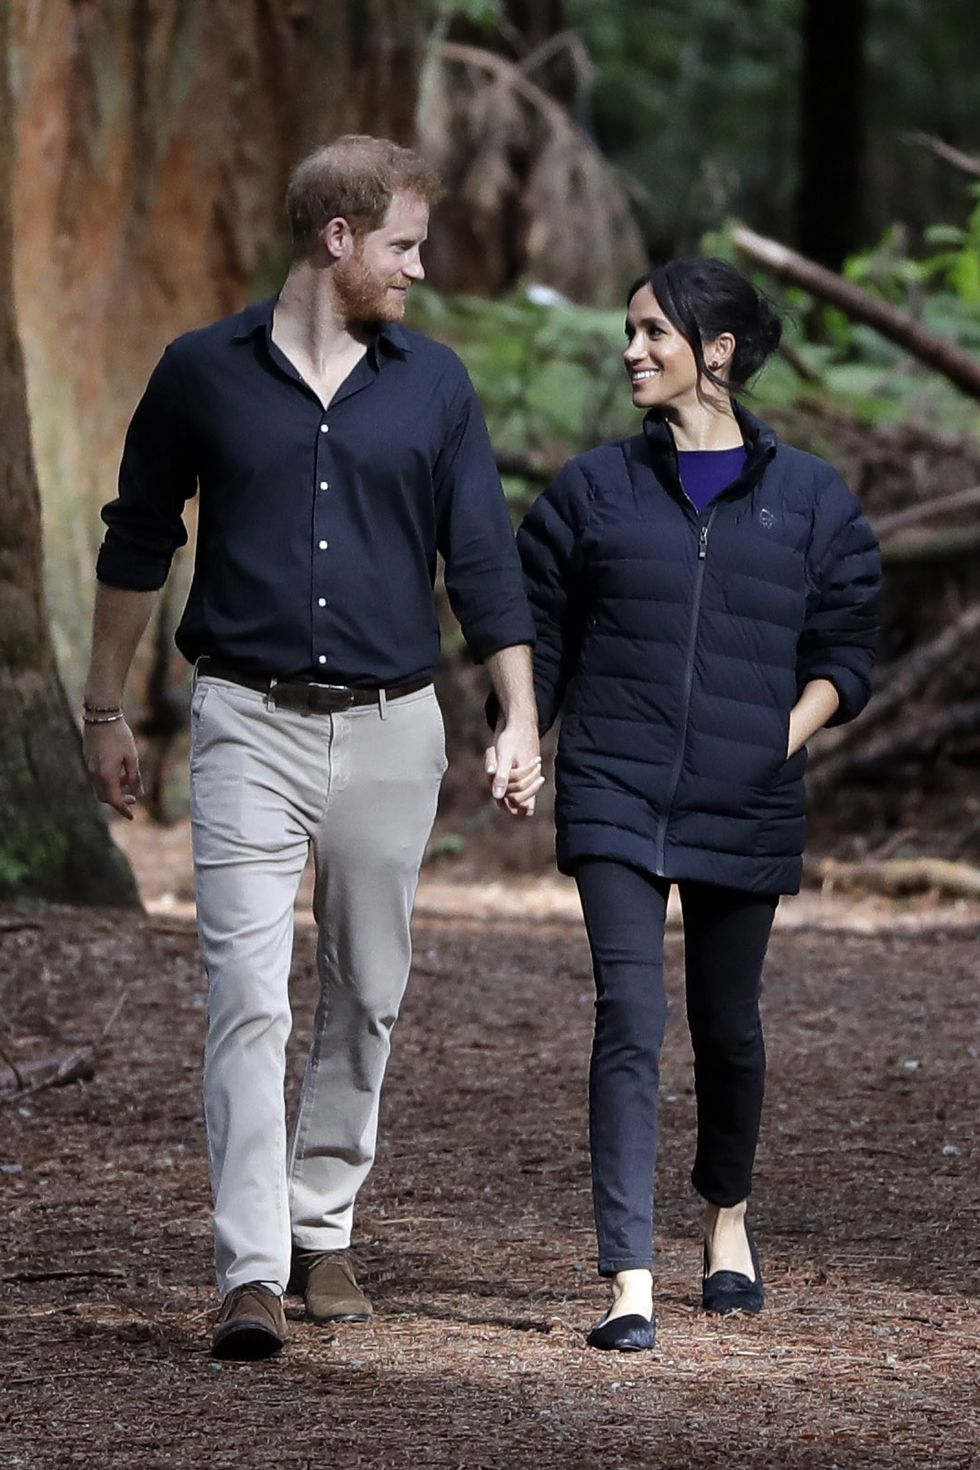 October 31, 2018. Redwoods treewalk, Rotorua